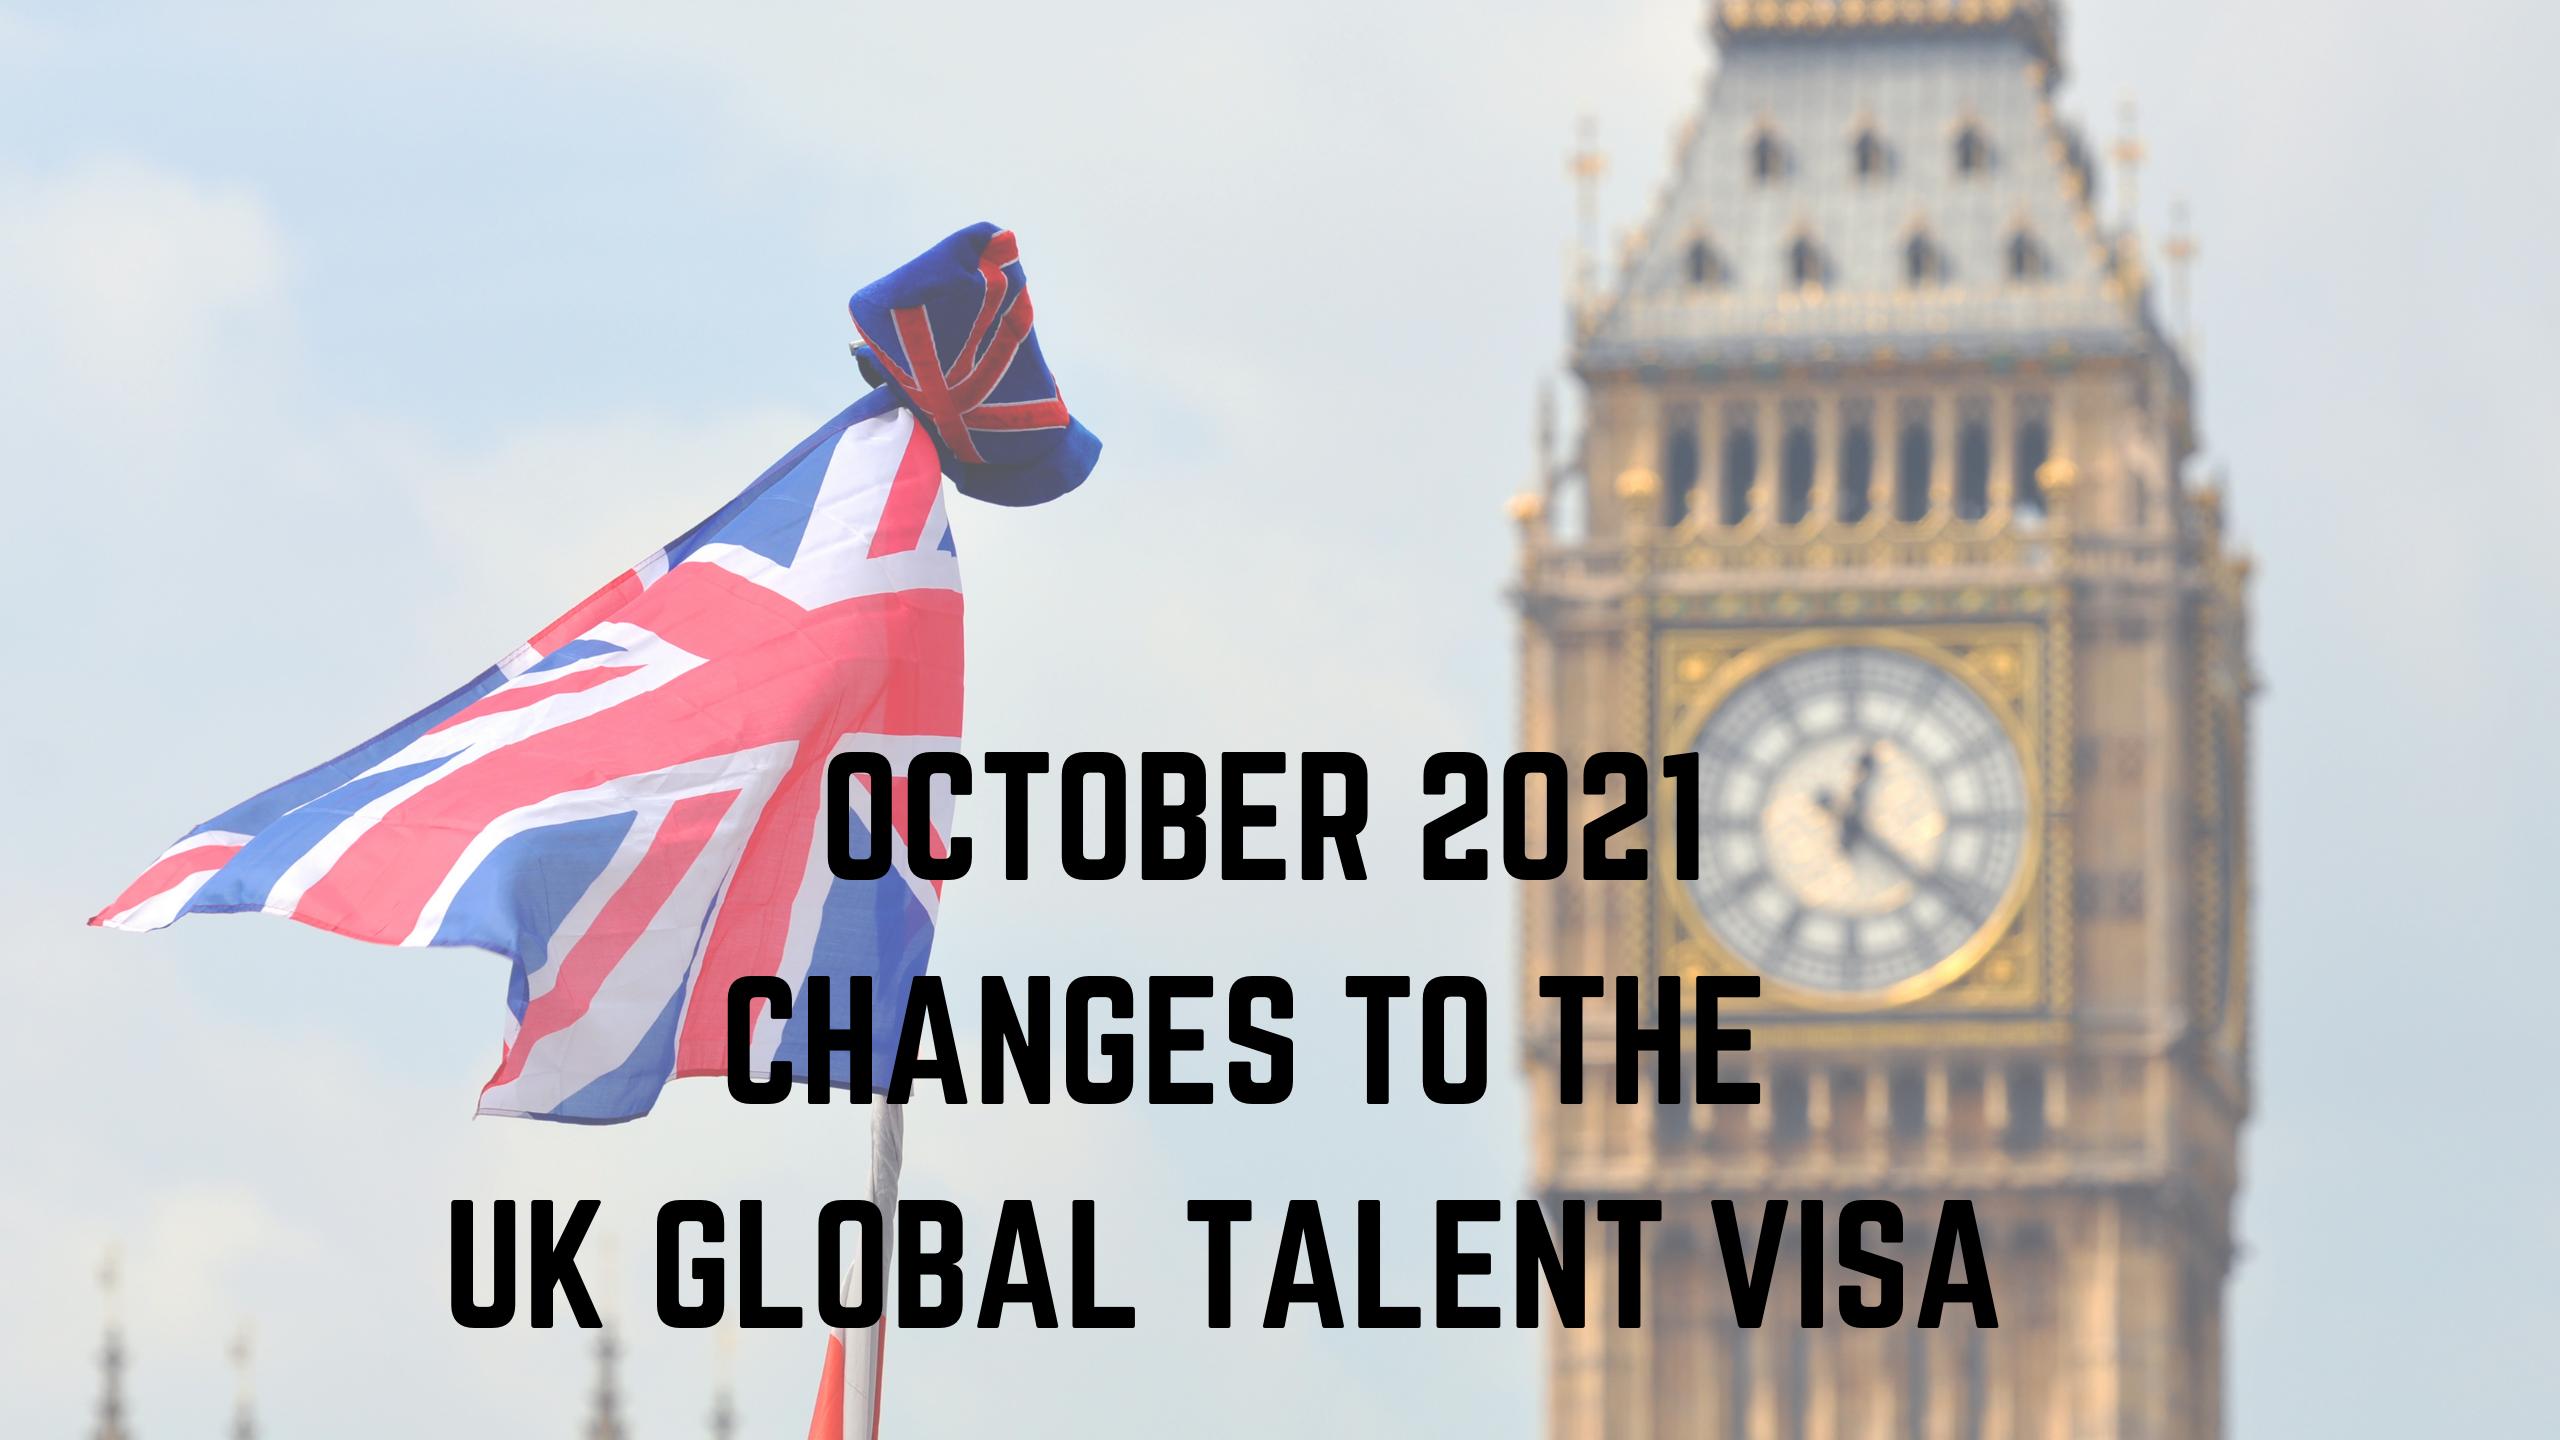 New Changes October 2021 - UK Global Talent Visa in Digital Technologies